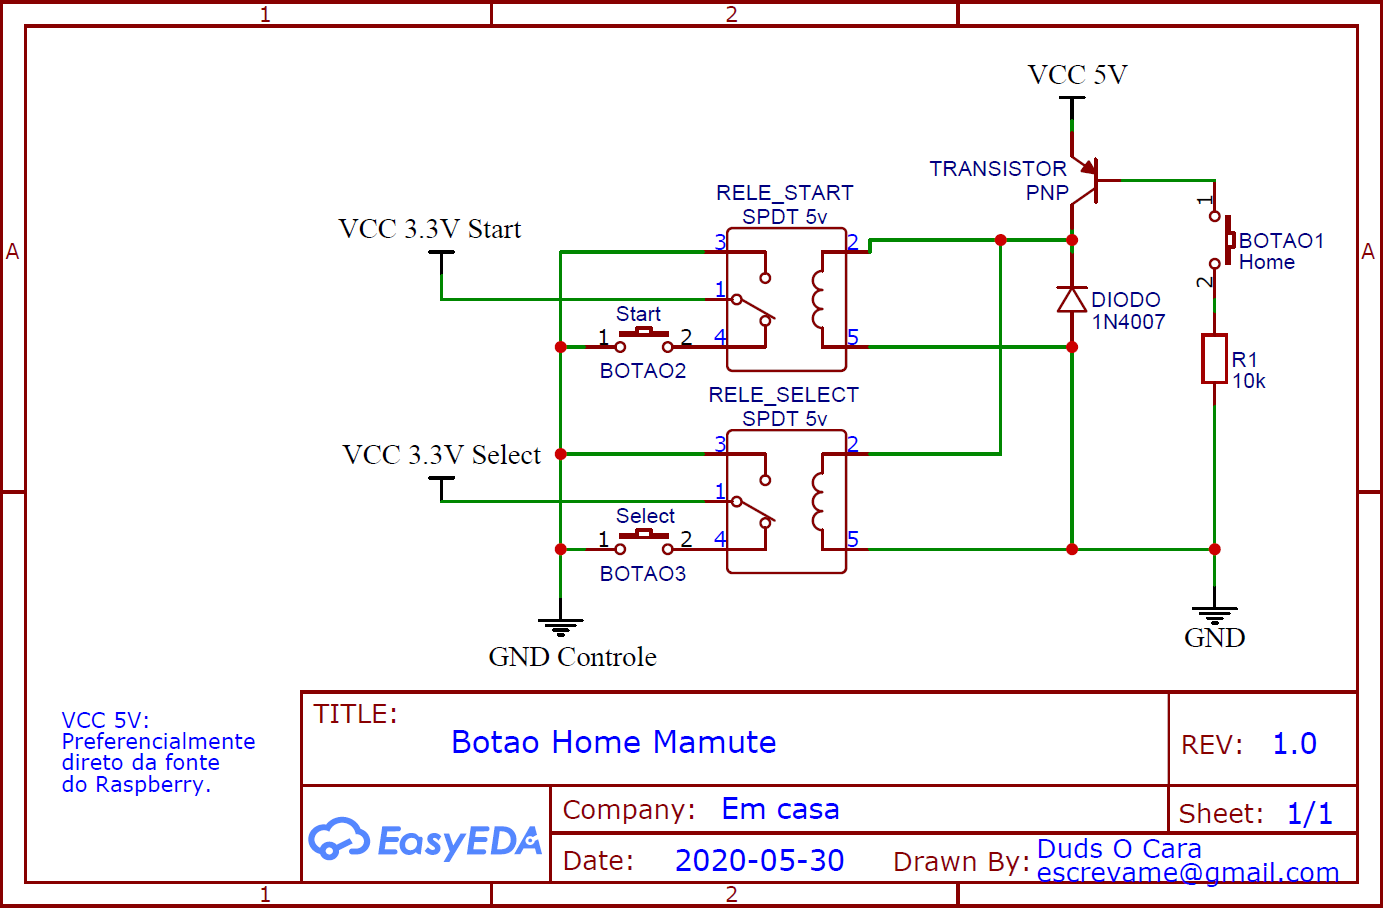 Botao-Home-Mamute-600x400_2020-05-31_19-26-44.png